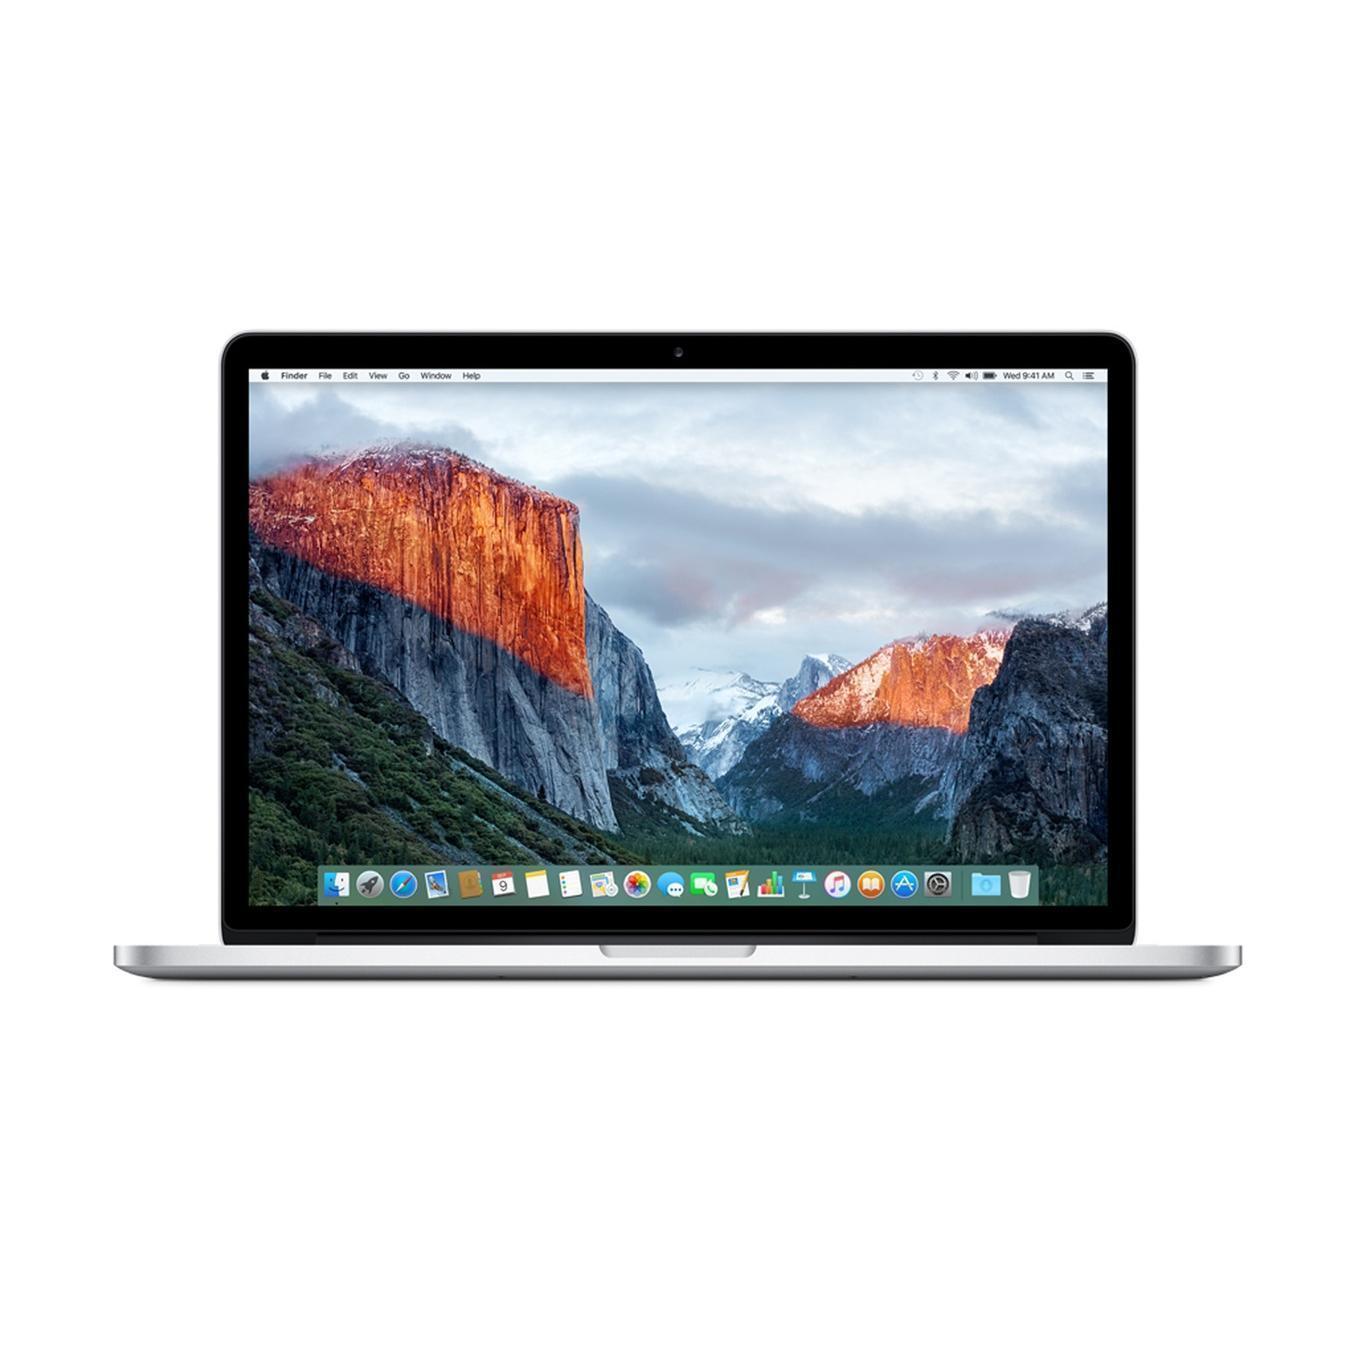 MacBook Pro Retina 15,4-tum (2012) - Core i7 - 16GB - SSD 512 GB AZERTY - Fransk